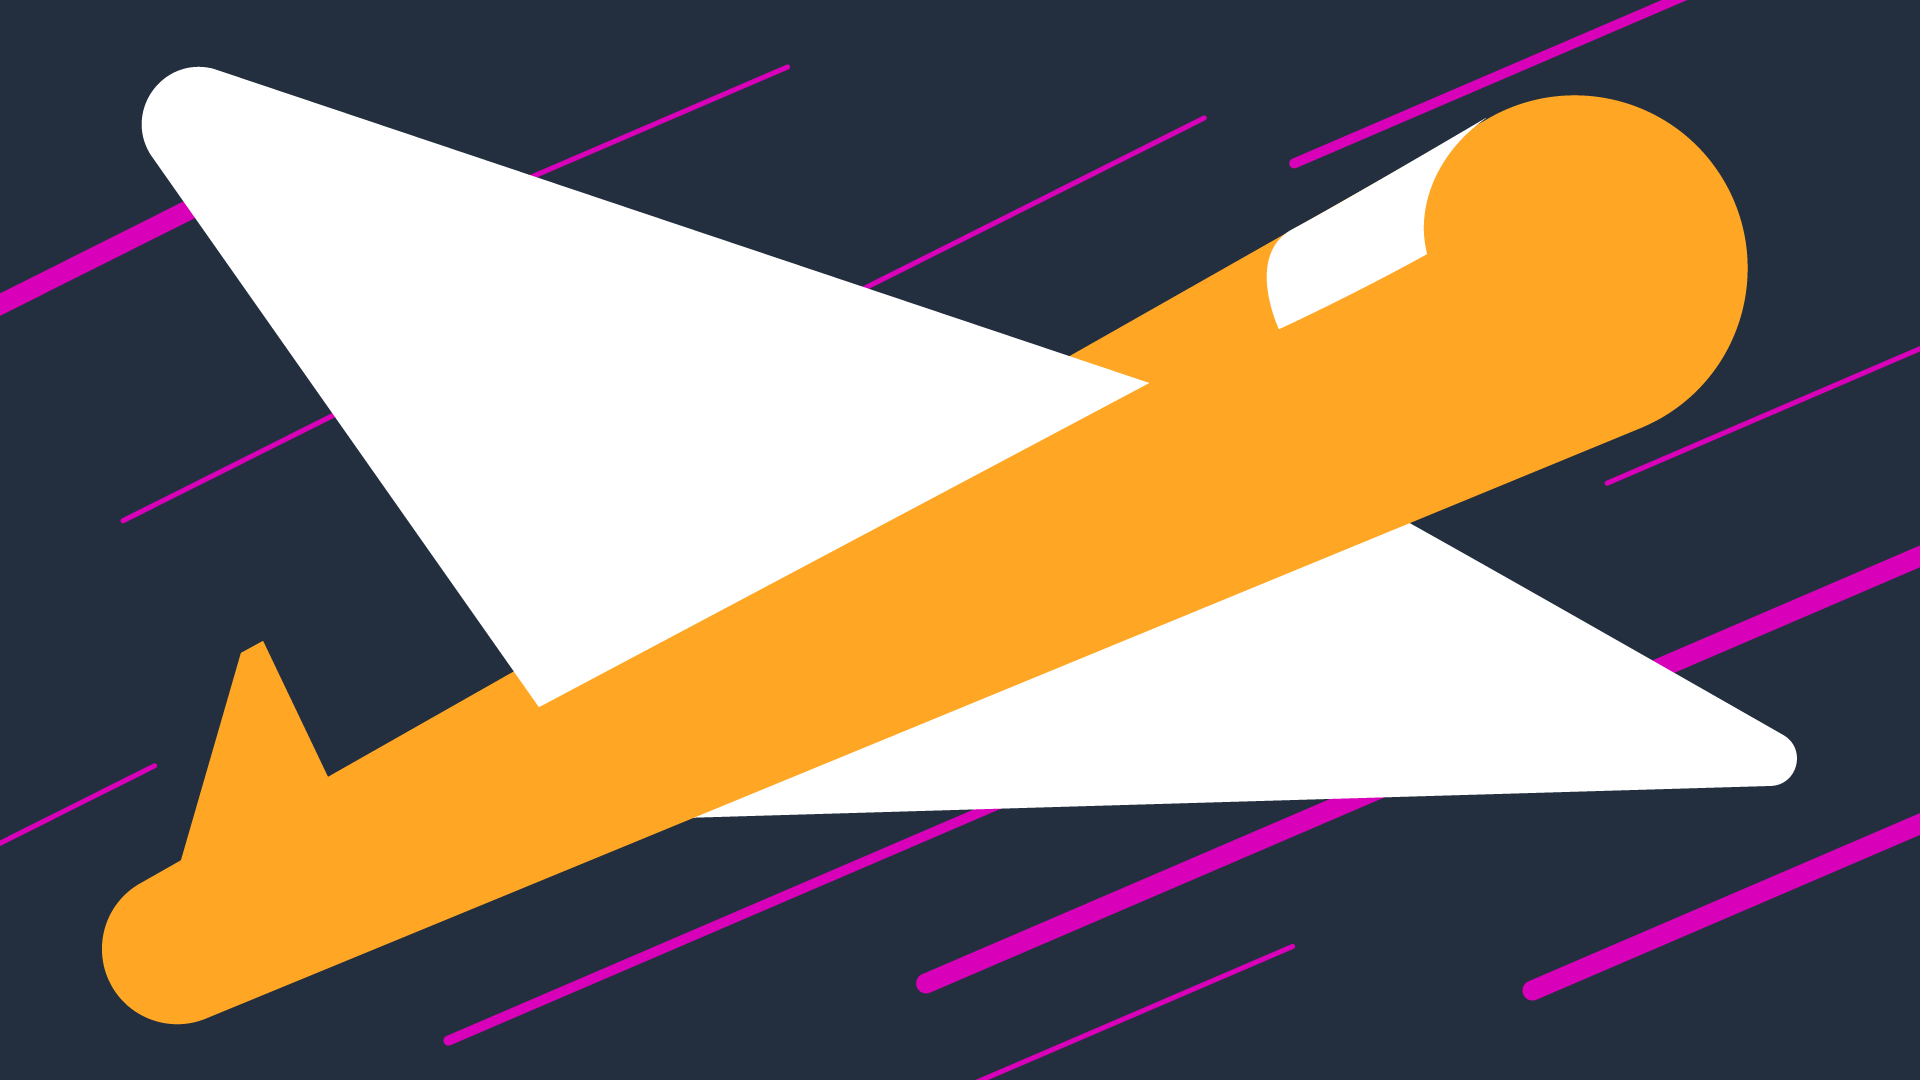 Plane_Design.png